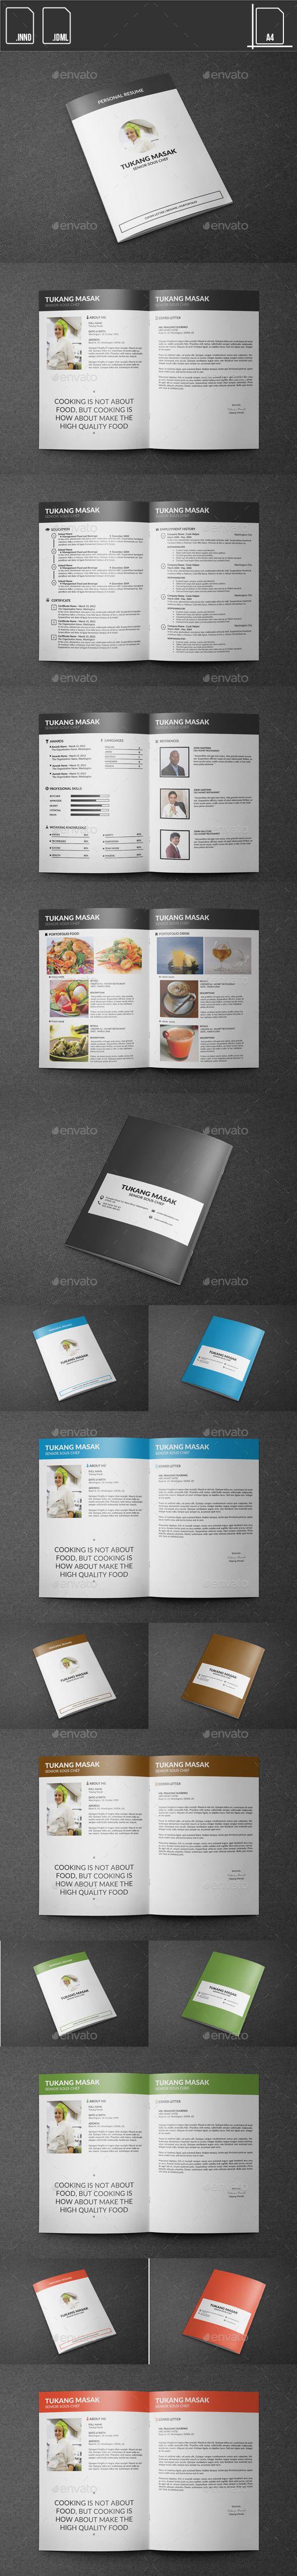 Resume Chef Booklet Template #design Download: http://graphicriver.net/item/resume-chef-booklet/11434028?ref=ksioks